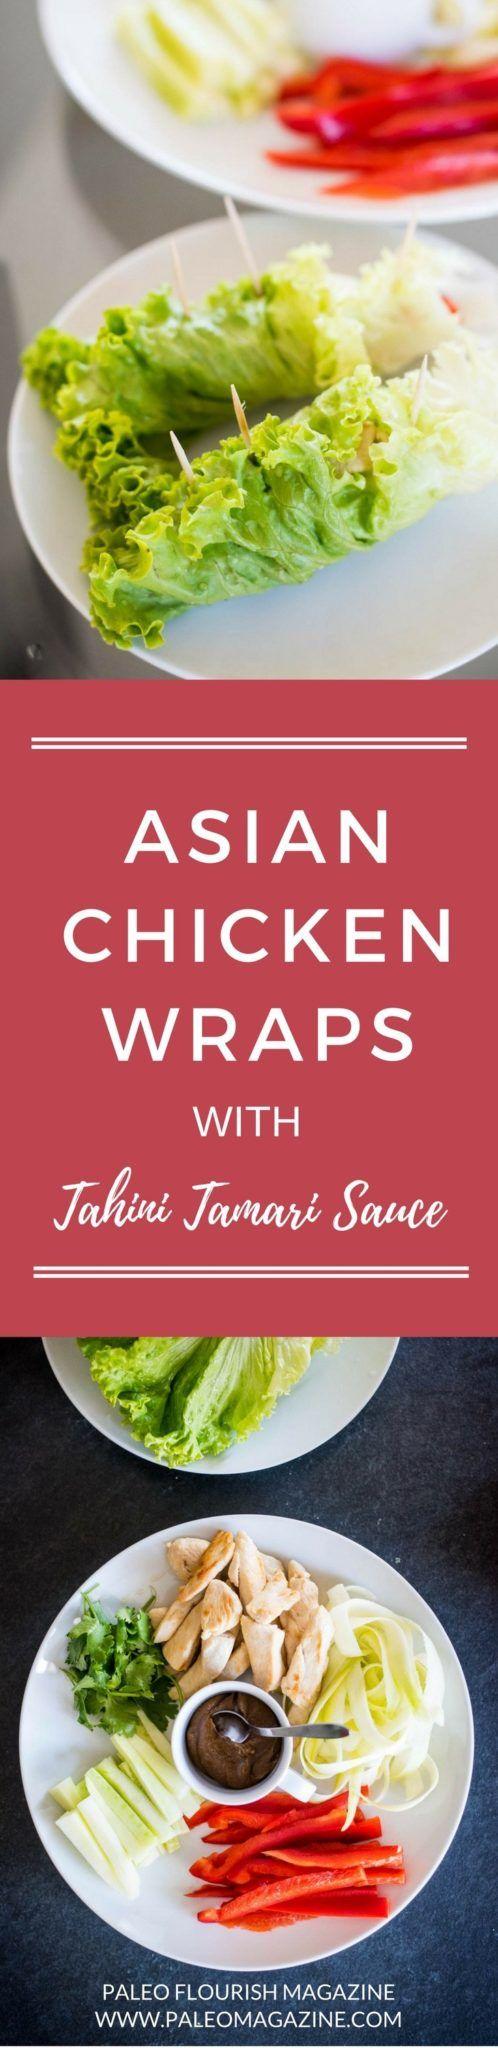 Asian Chicken Wraps with Tahini Tamari Sauce [Paleo, Keto] #paleo #keto #recipes - https://paleoflourish.com/asian-chicken-wraps-recipe